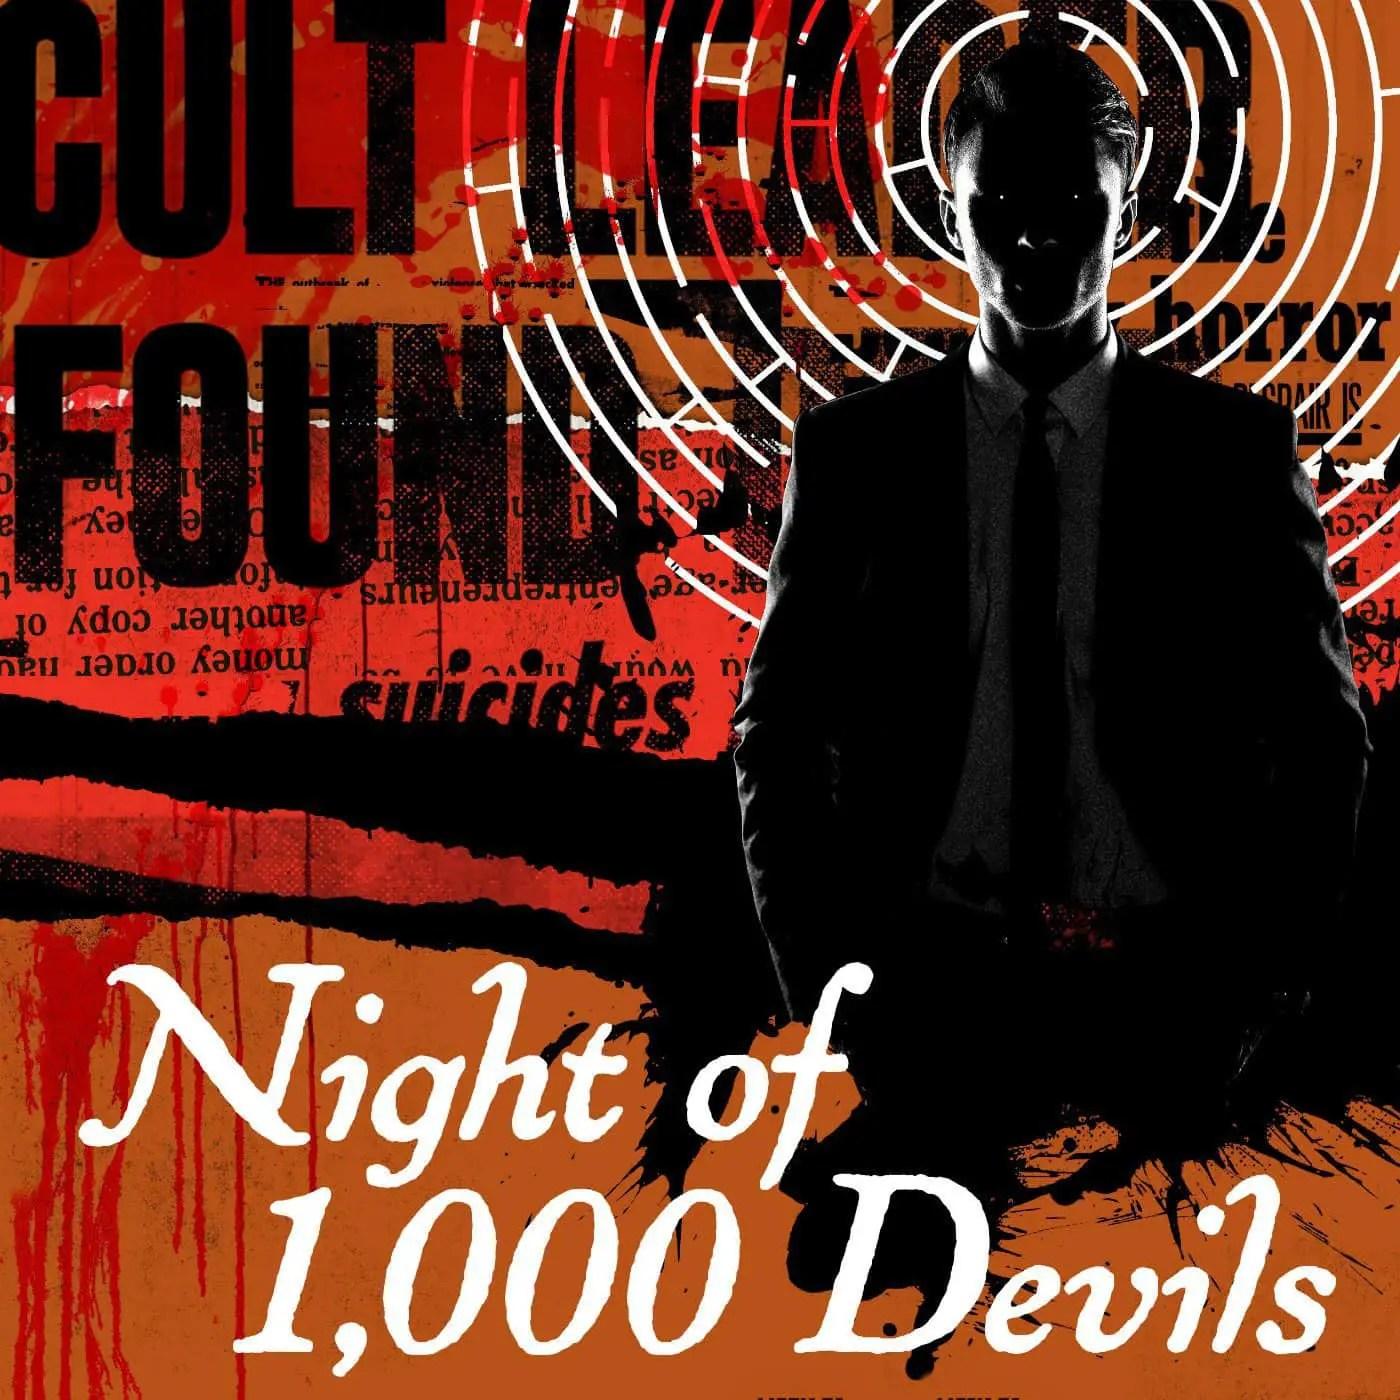 Drunken Devil - Night of 1,000 Devils - Immersive Halloween Party - Formal Attire - Cults